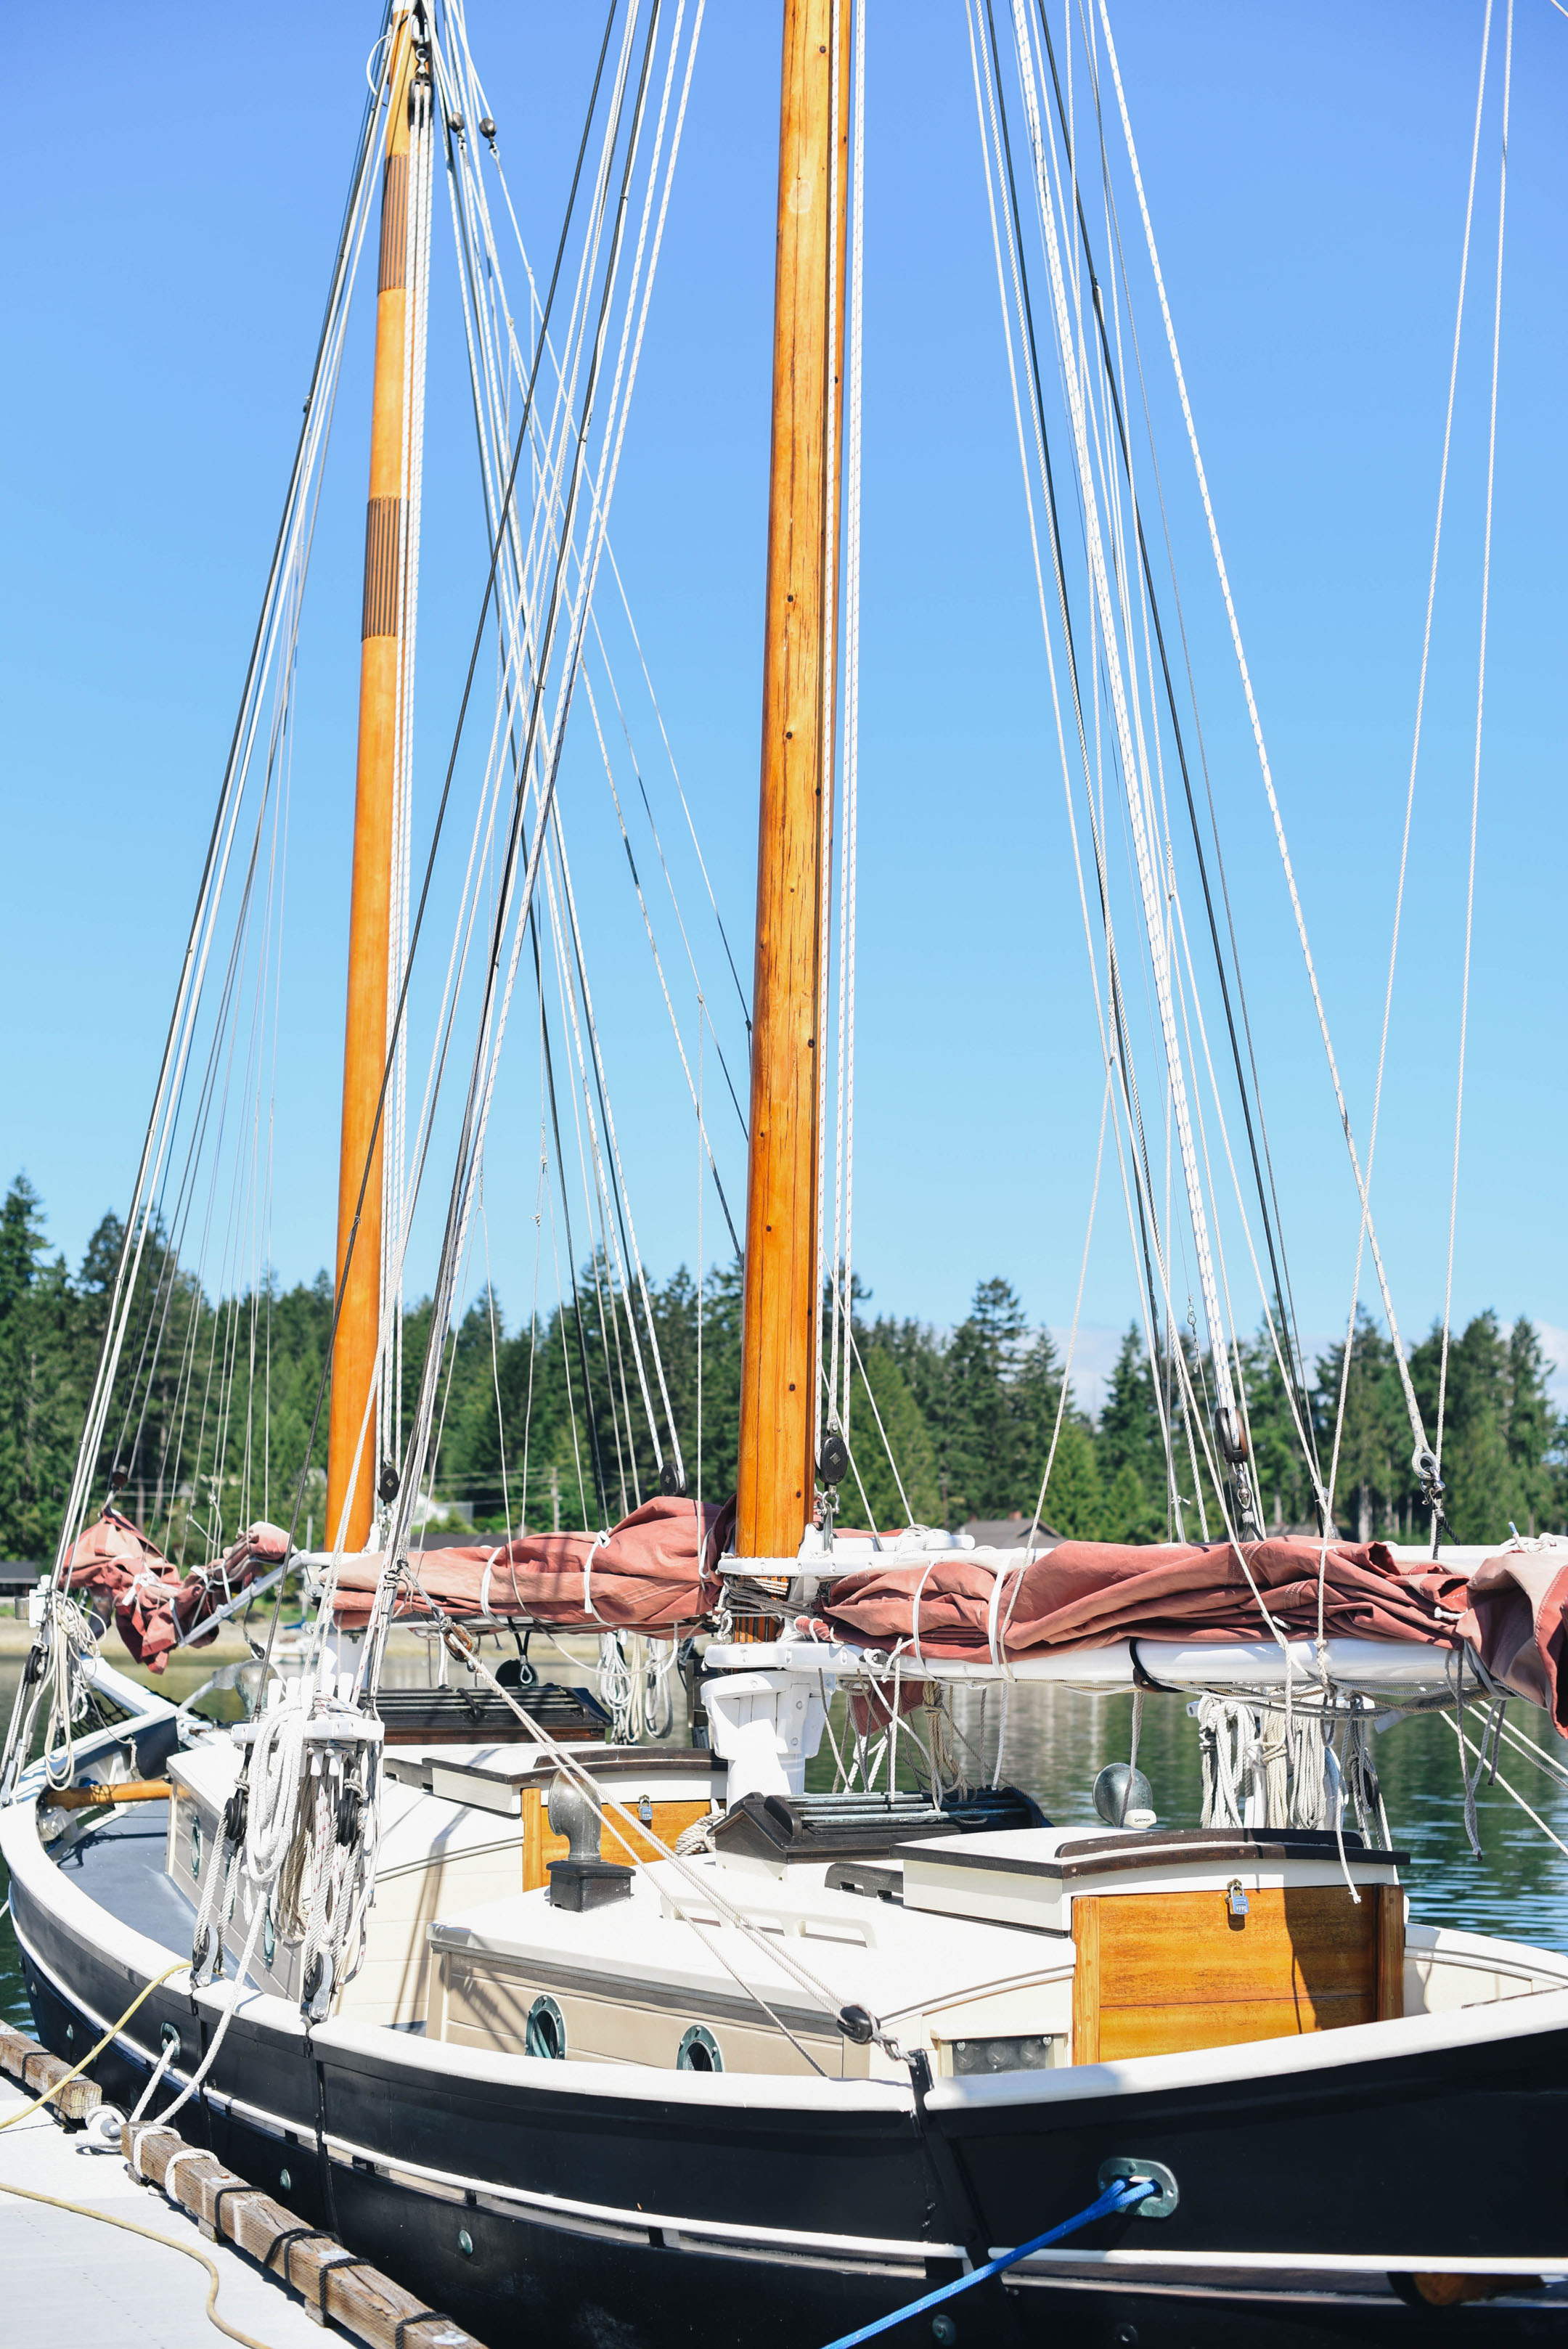 boats at alderbrook resort